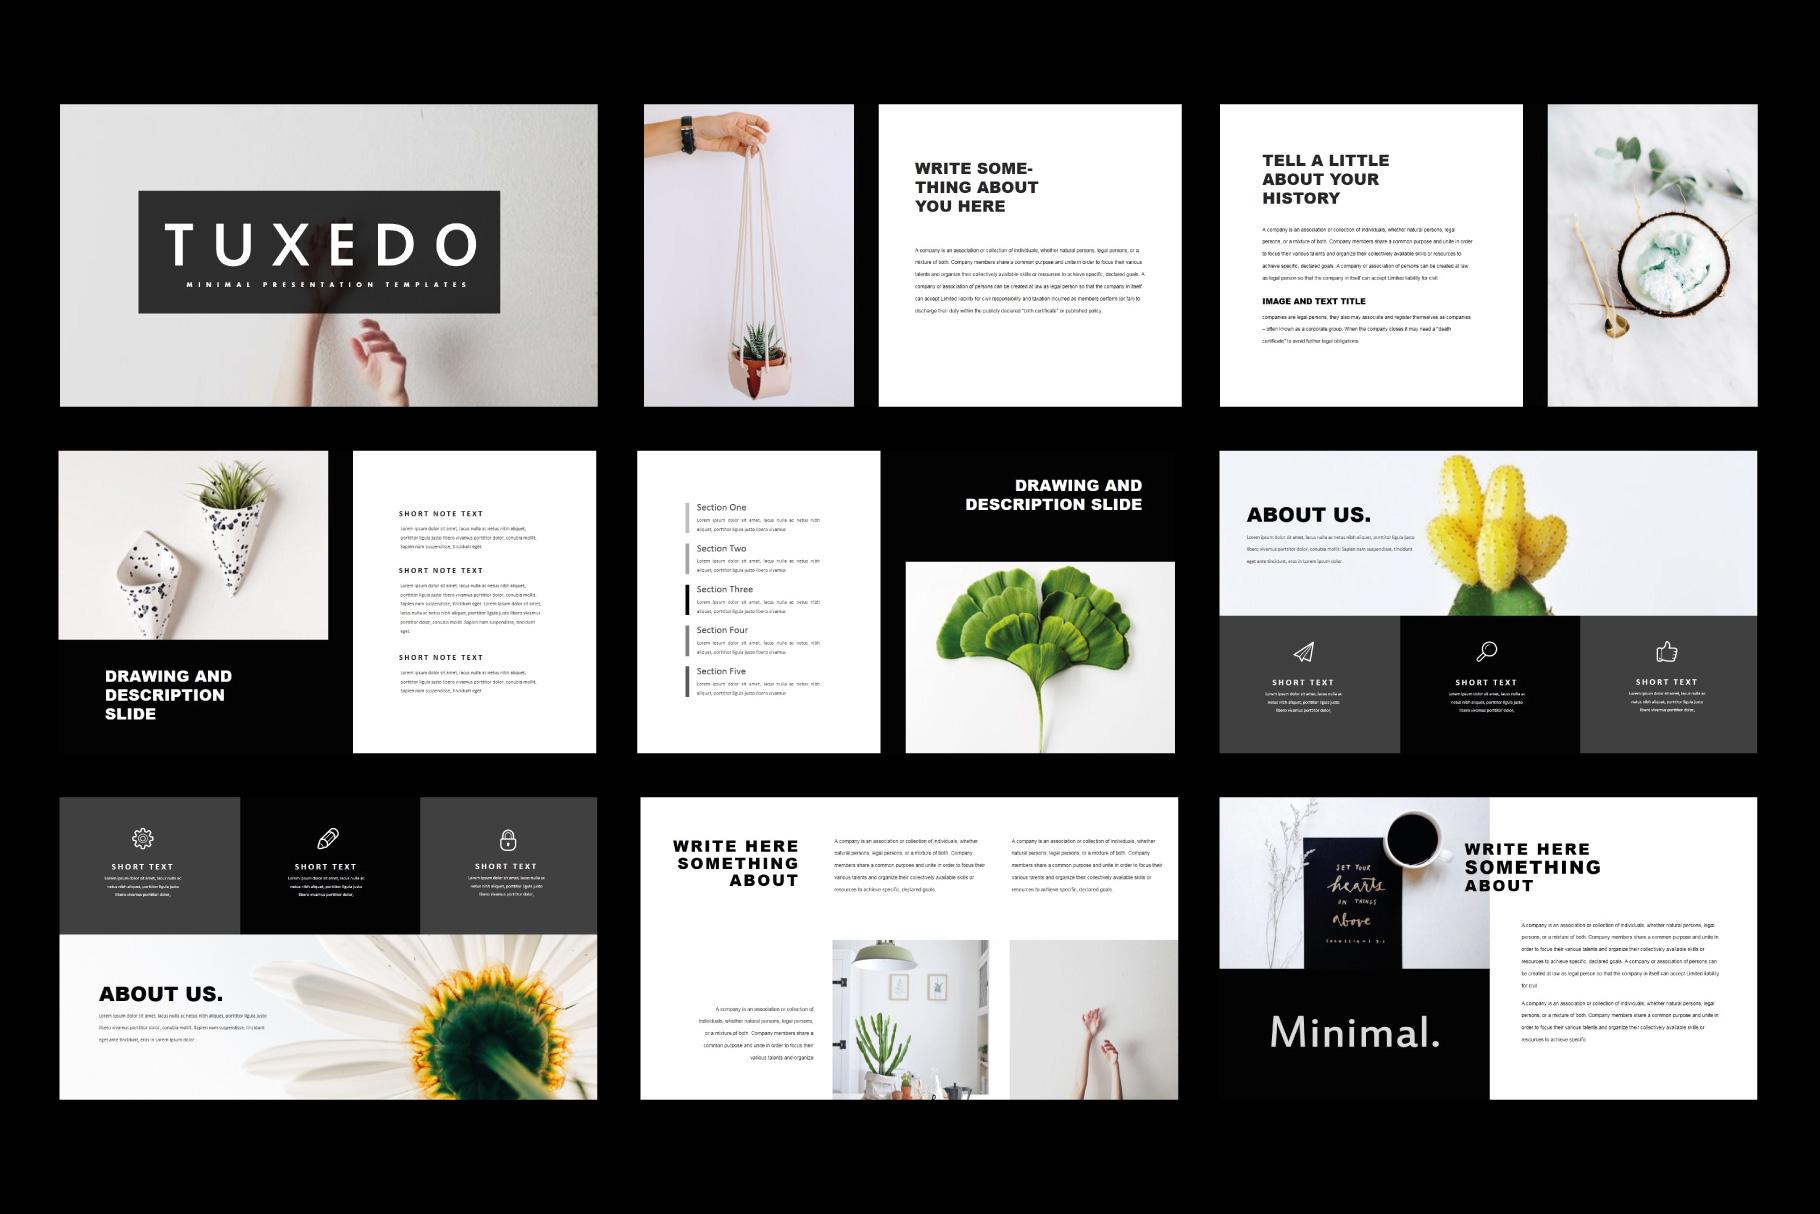 Tuxedo Minimal PowerPoint Templates example image 2